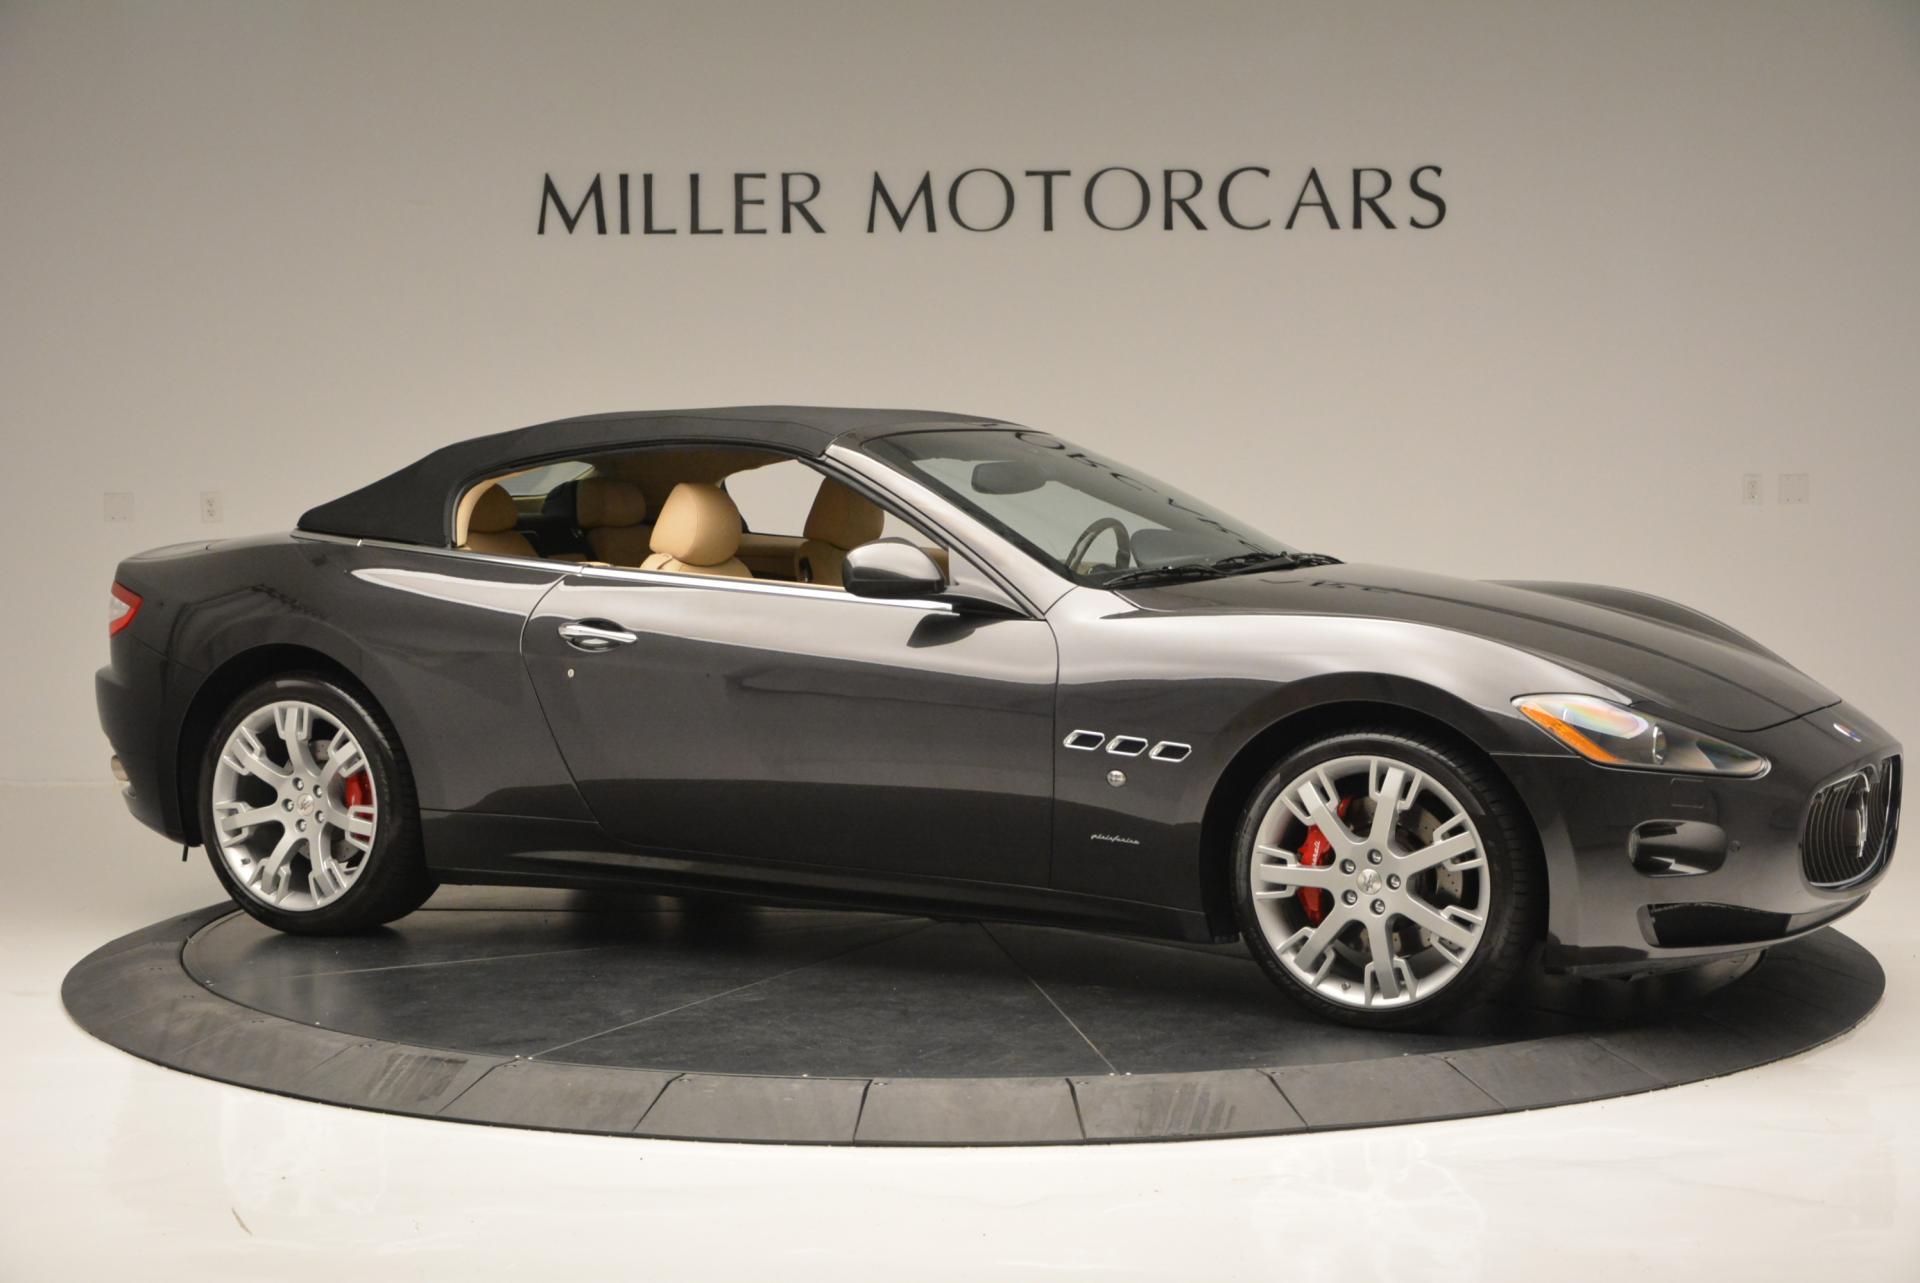 Used 2011 Maserati GranTurismo Base For Sale In Westport, CT 158_p23